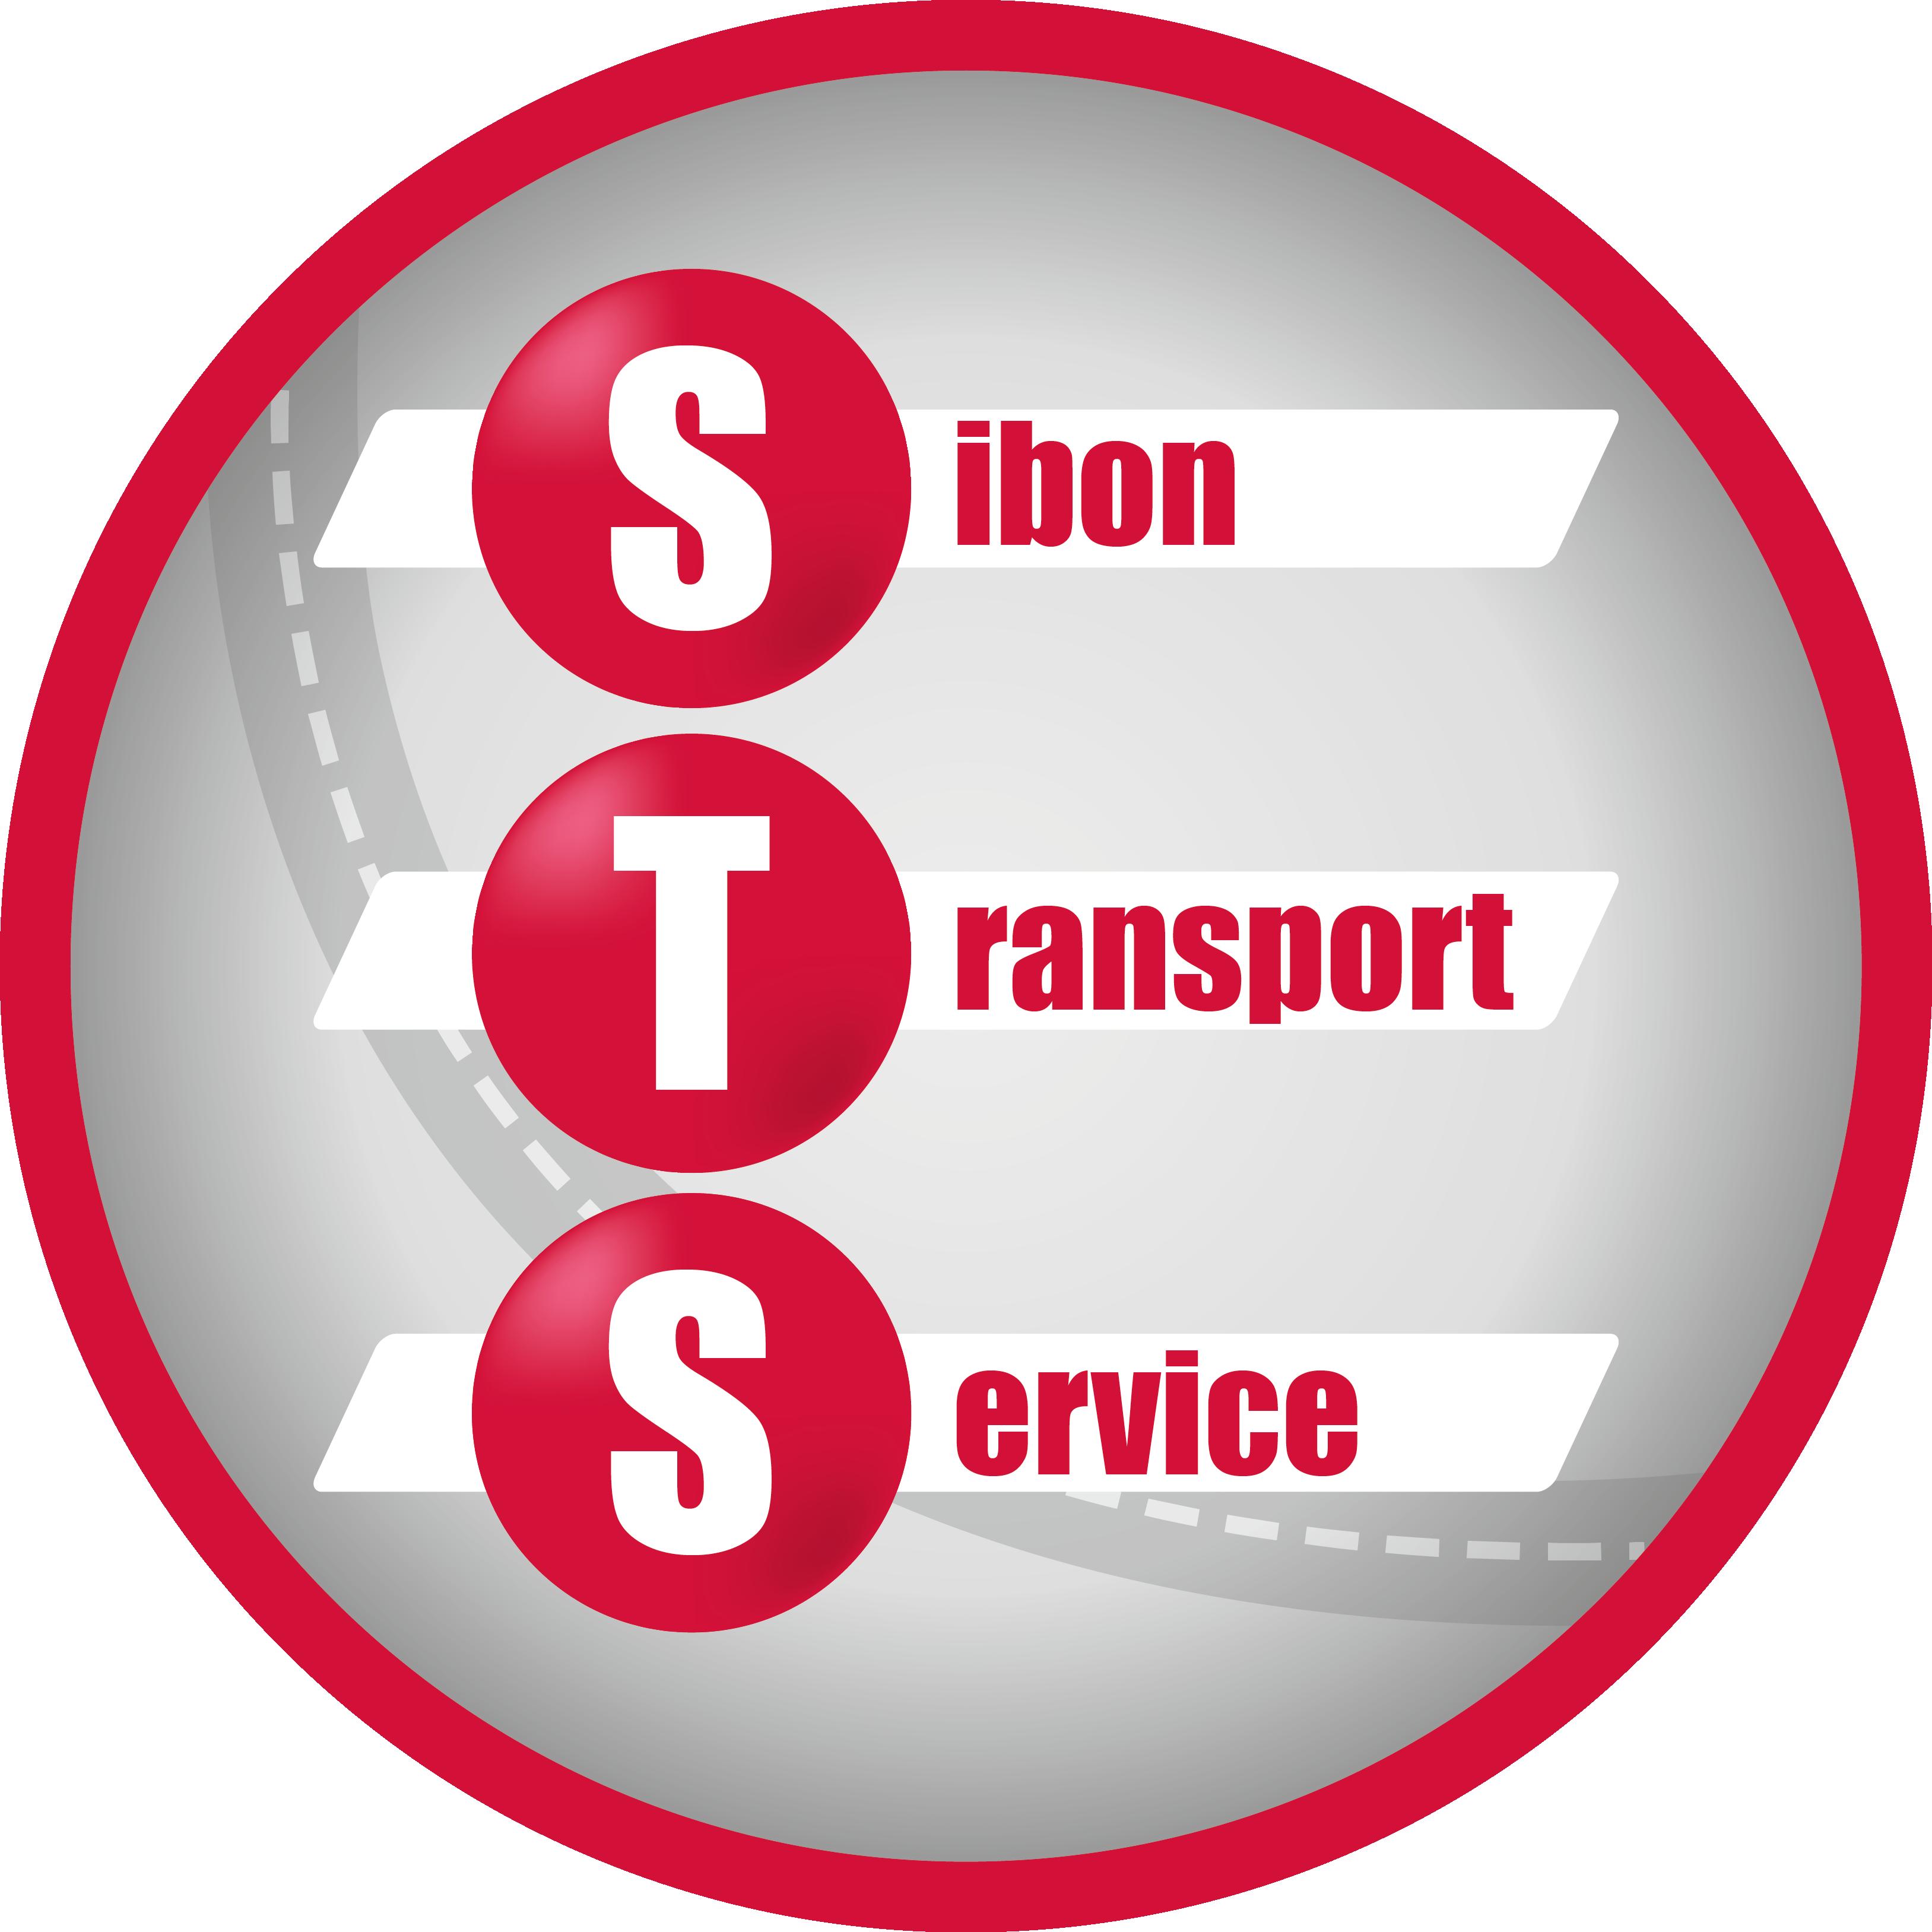 Sibon Transport Service